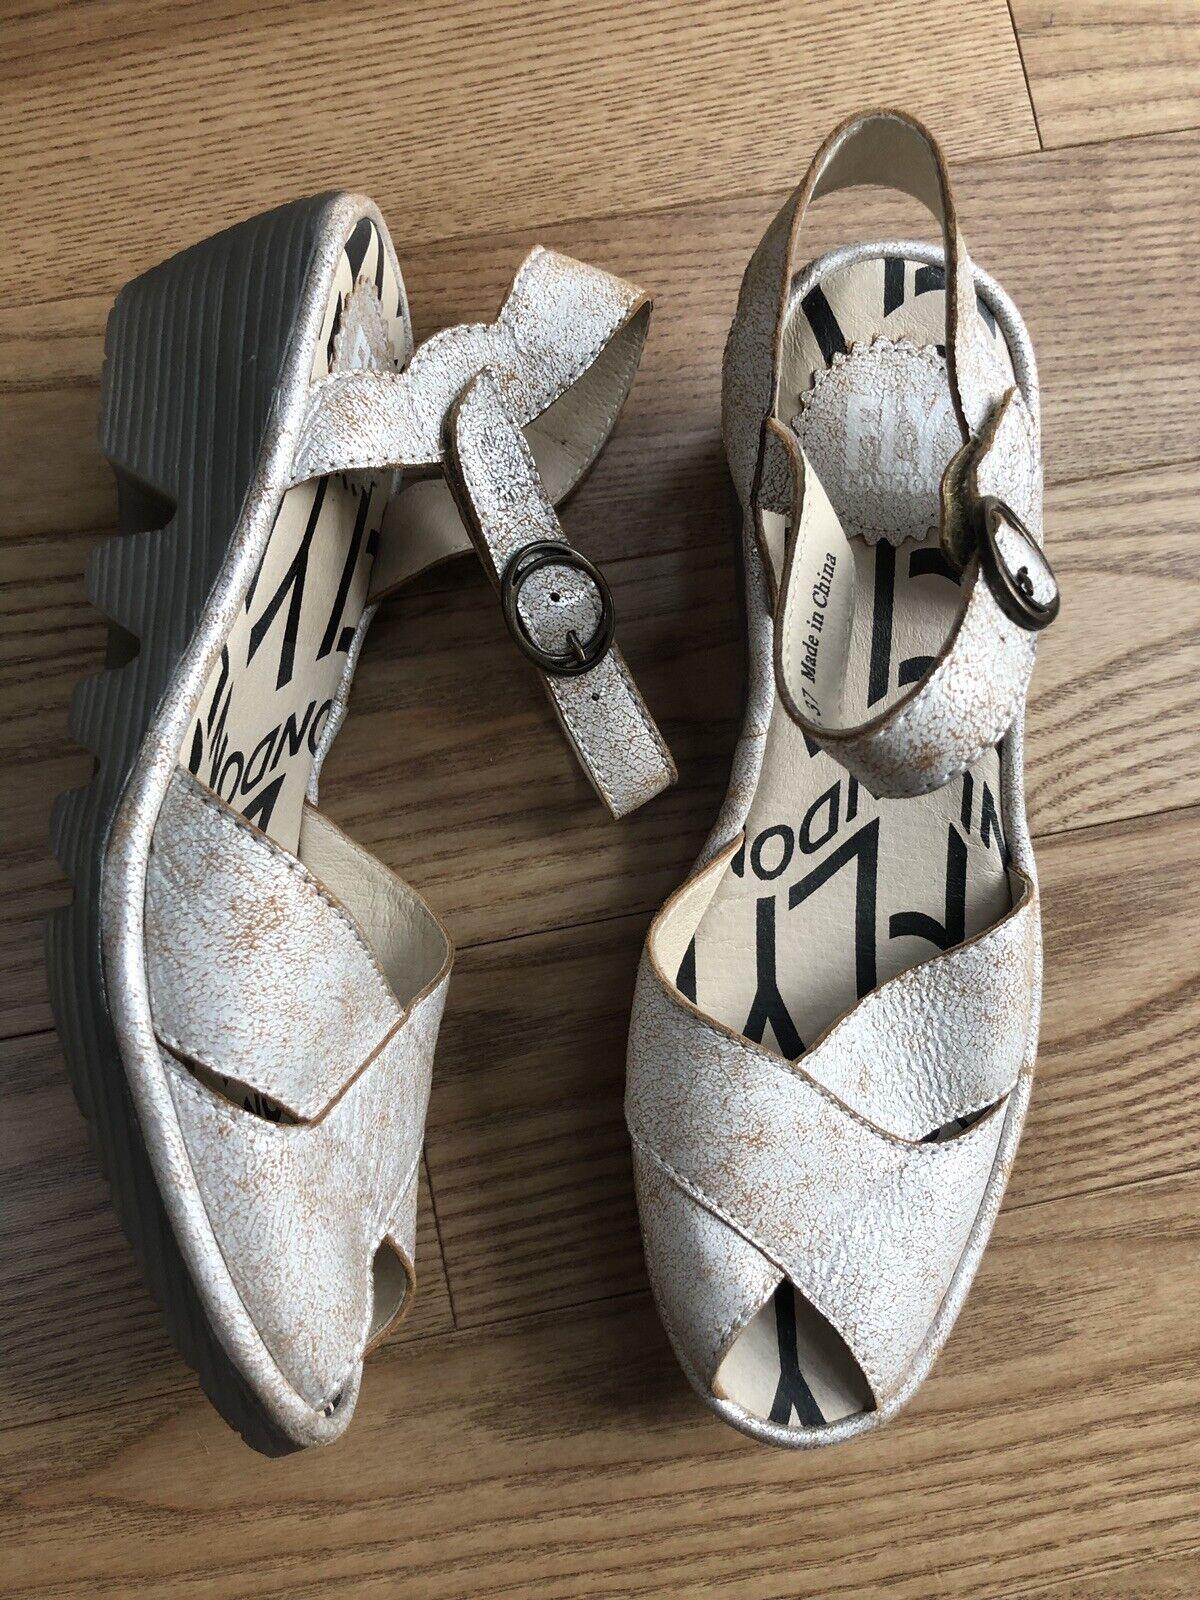 New   FLY London Women Pero Silver Metallic Crackle Peep Toe Wedge Sz 37